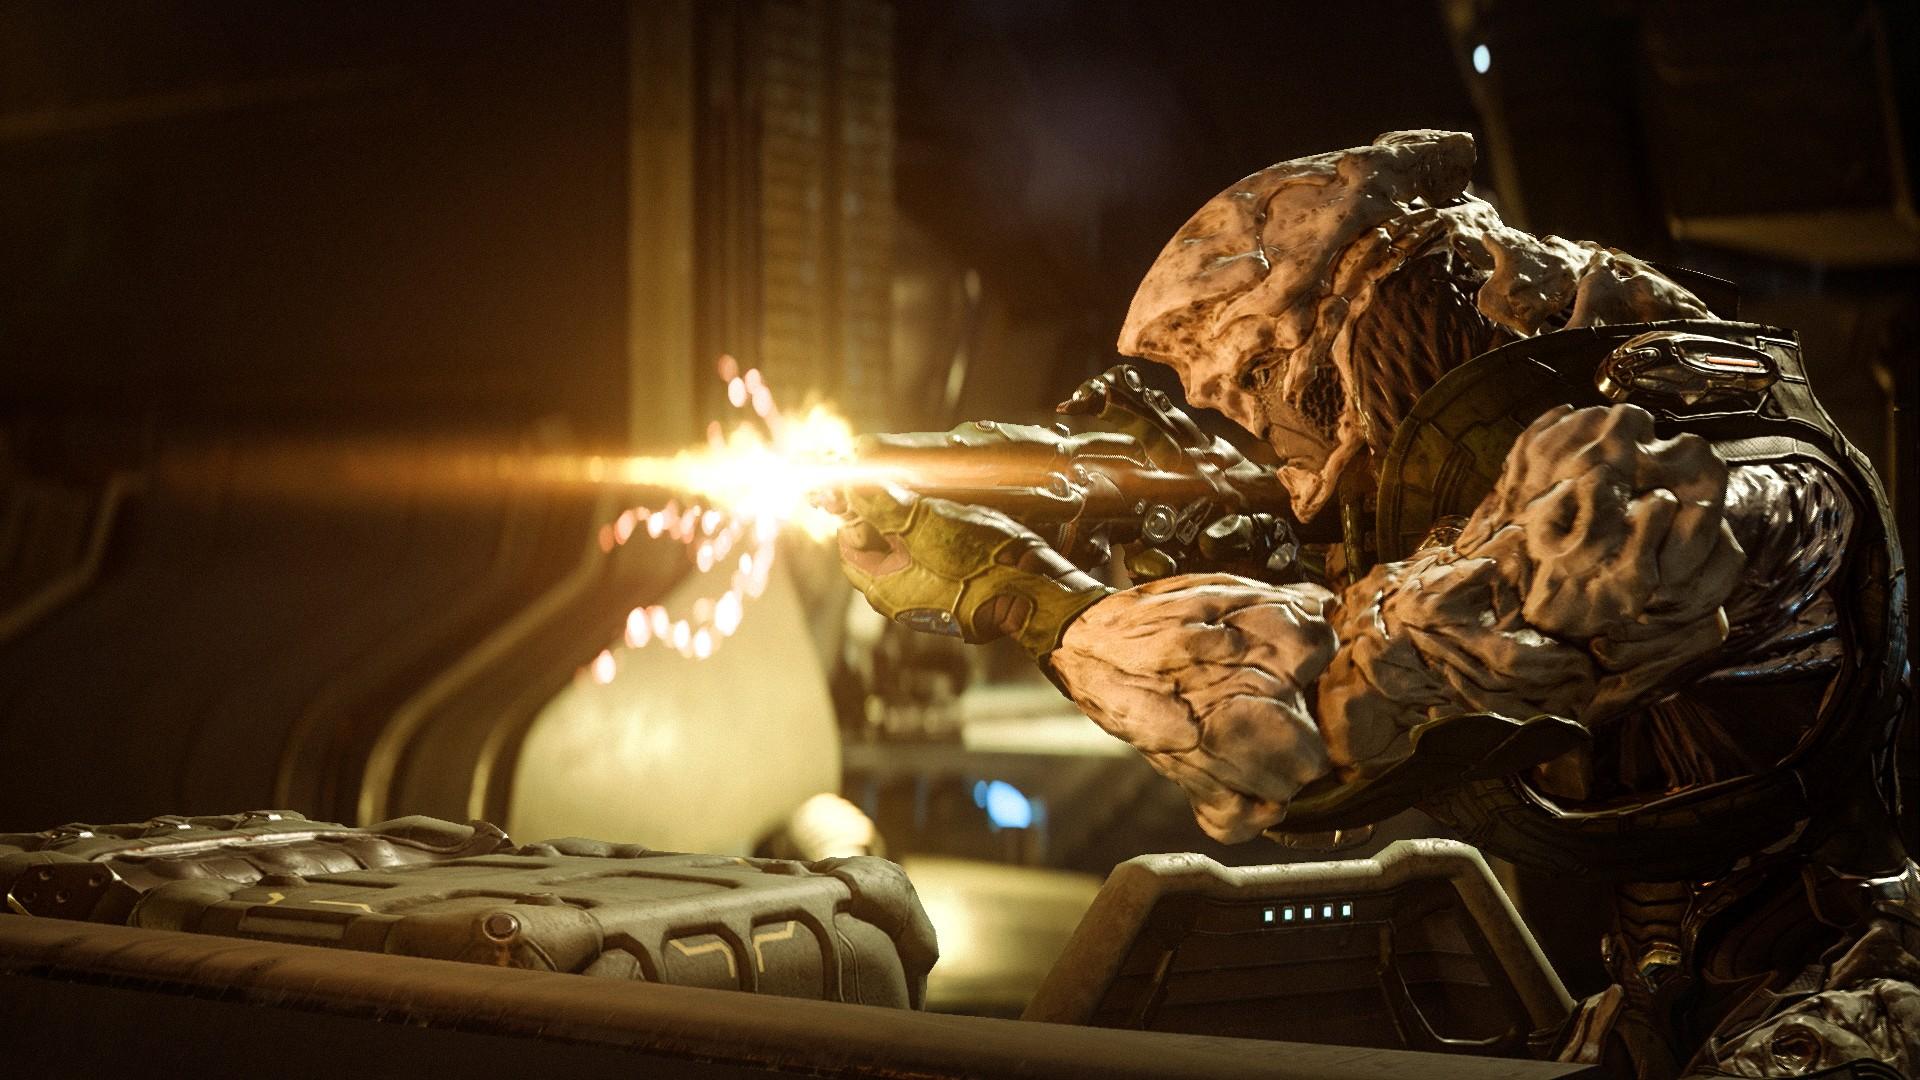 Mass-Effect-Andromeda_2017_02-23-17_001